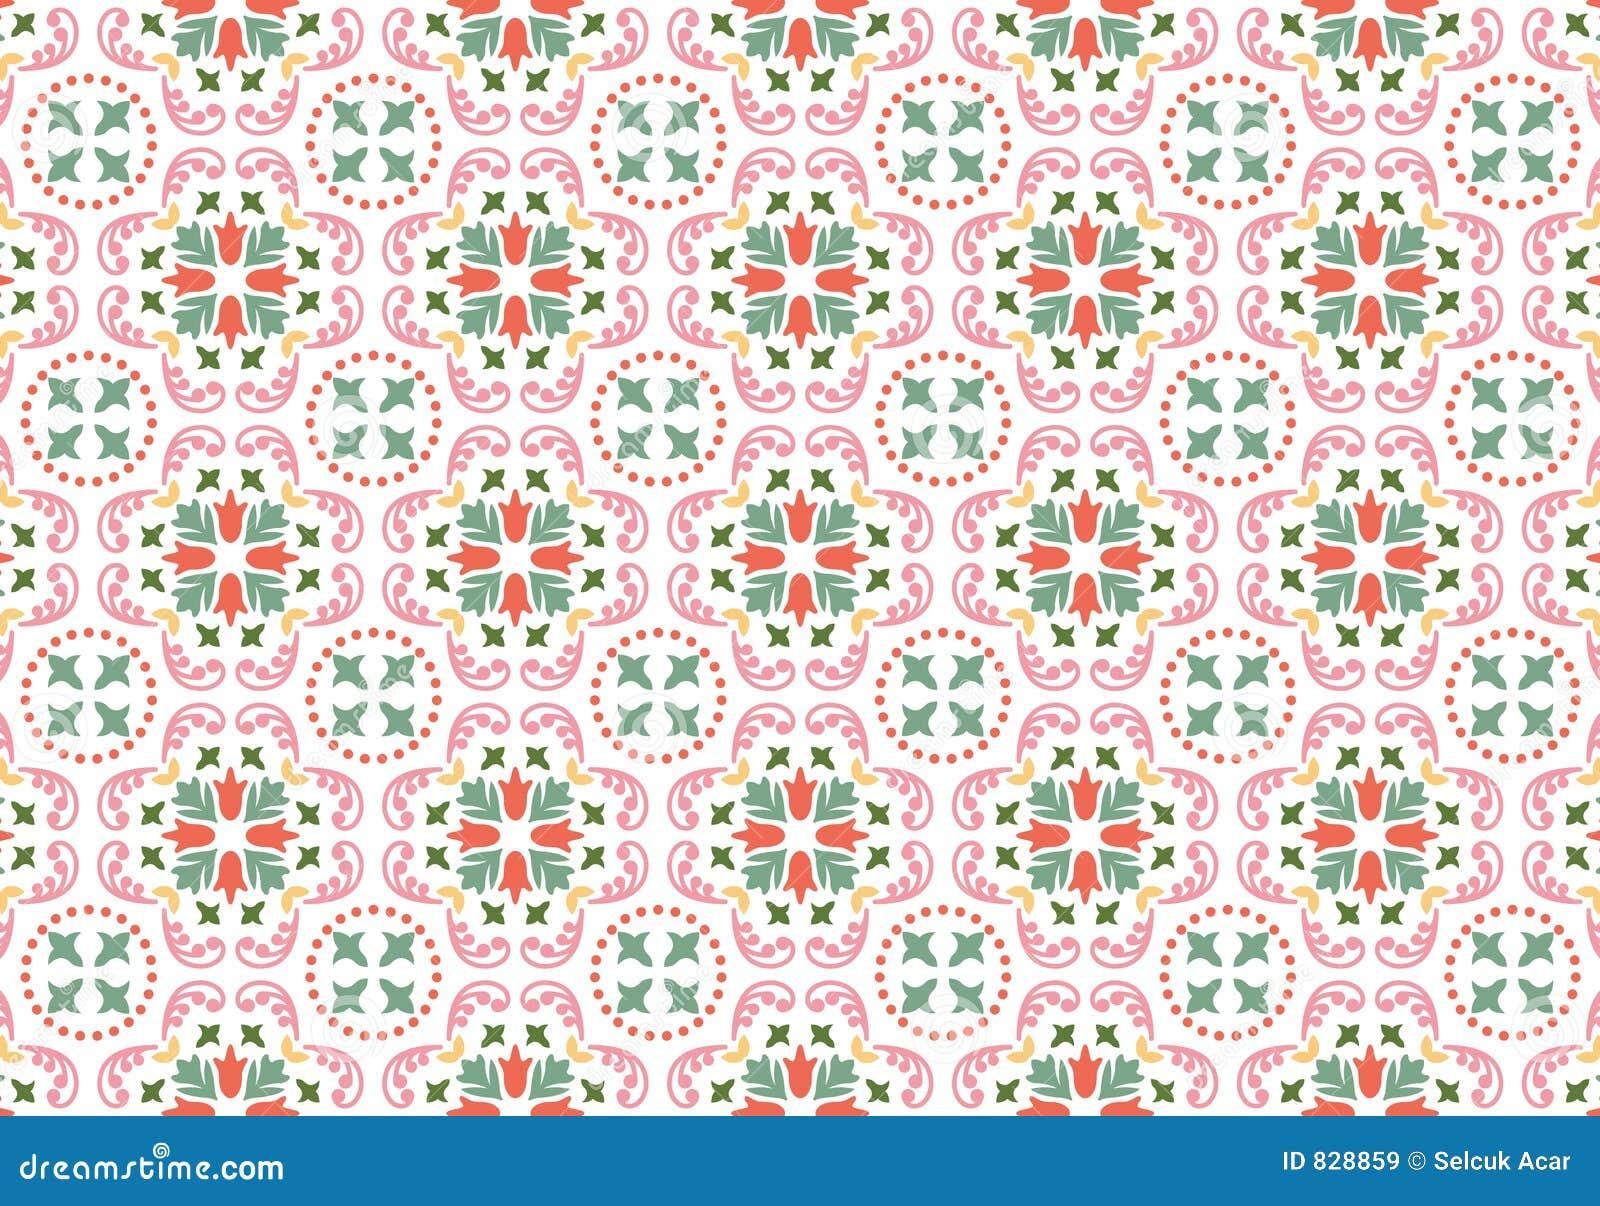 Wallpaer pattern